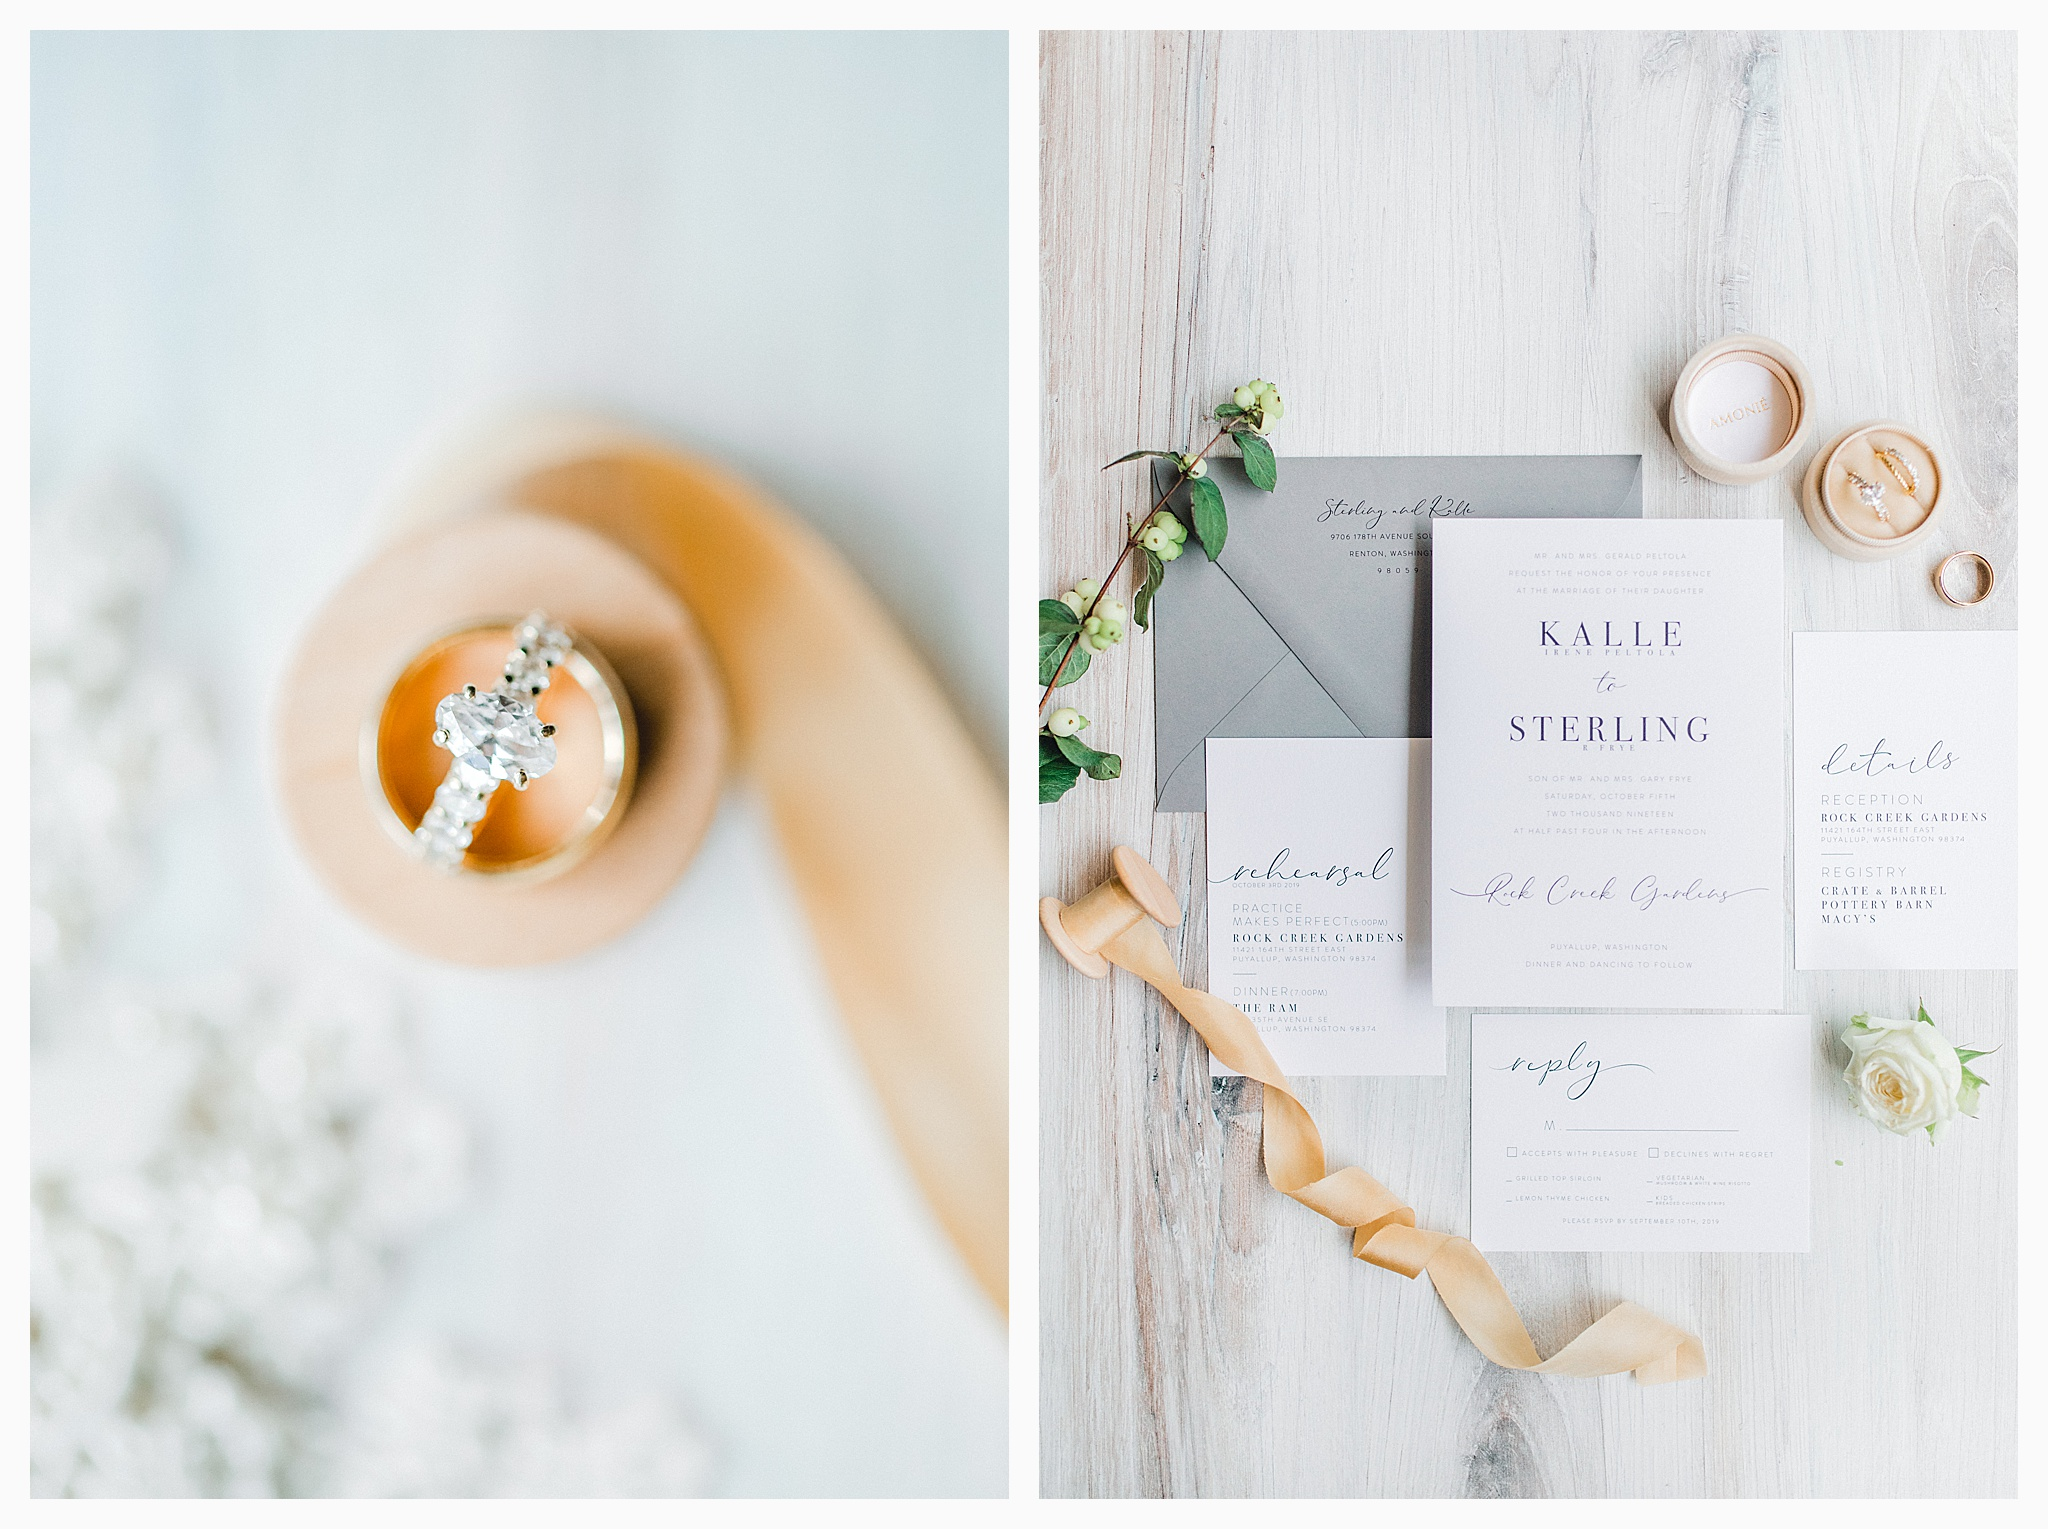 Emma Rose Company Light and Airy Wedding Photographer, Beautiful fall wedding at Rock Creek Gardens Venue in Puyallup, Washington._0005.jpg